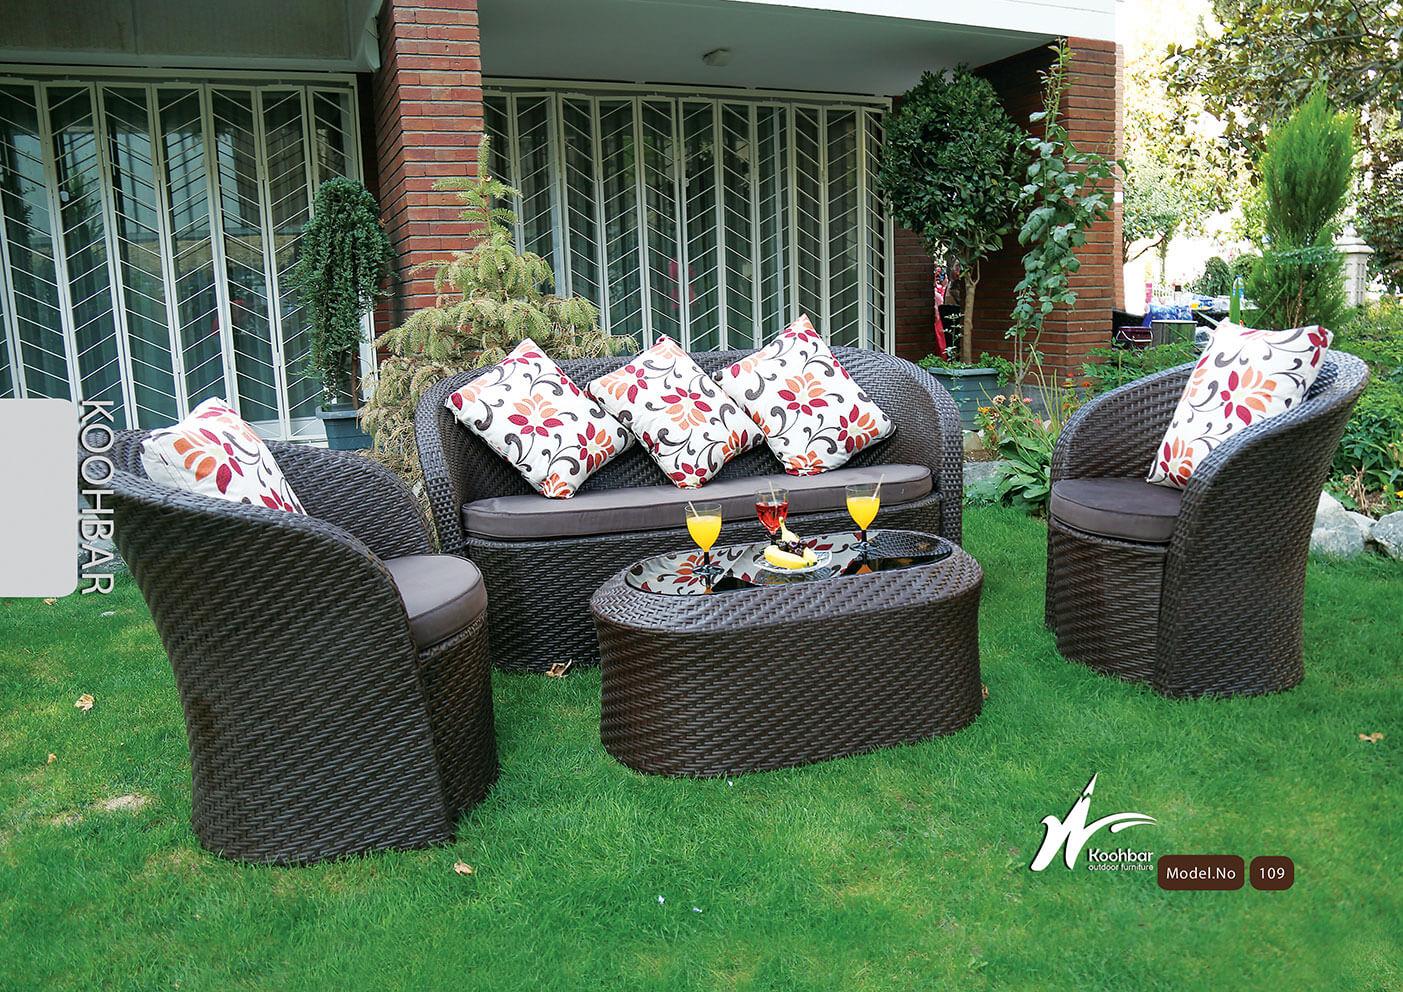 kohbar patio conversation sets 109 model0 - ست مبلمان فضای باز کوهبر مدل ۱۰۹ - - patio-conversation-sets